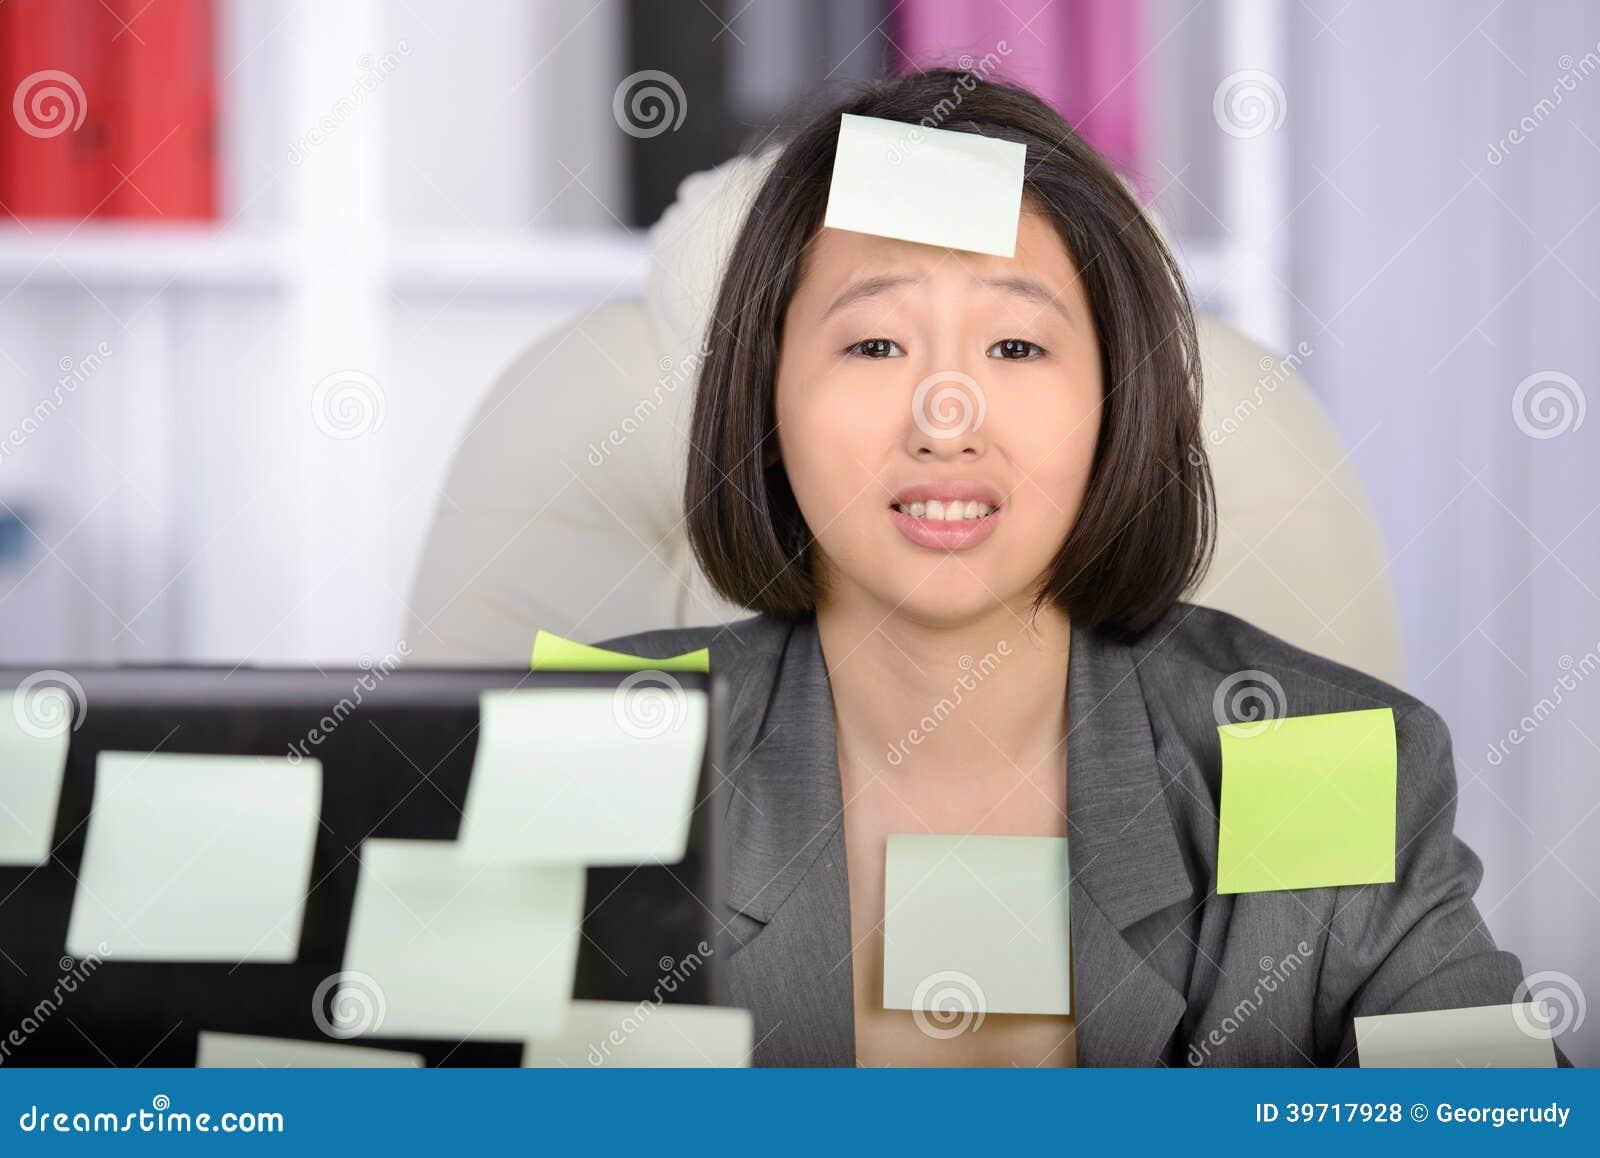 AWIB - Asian Women In Business